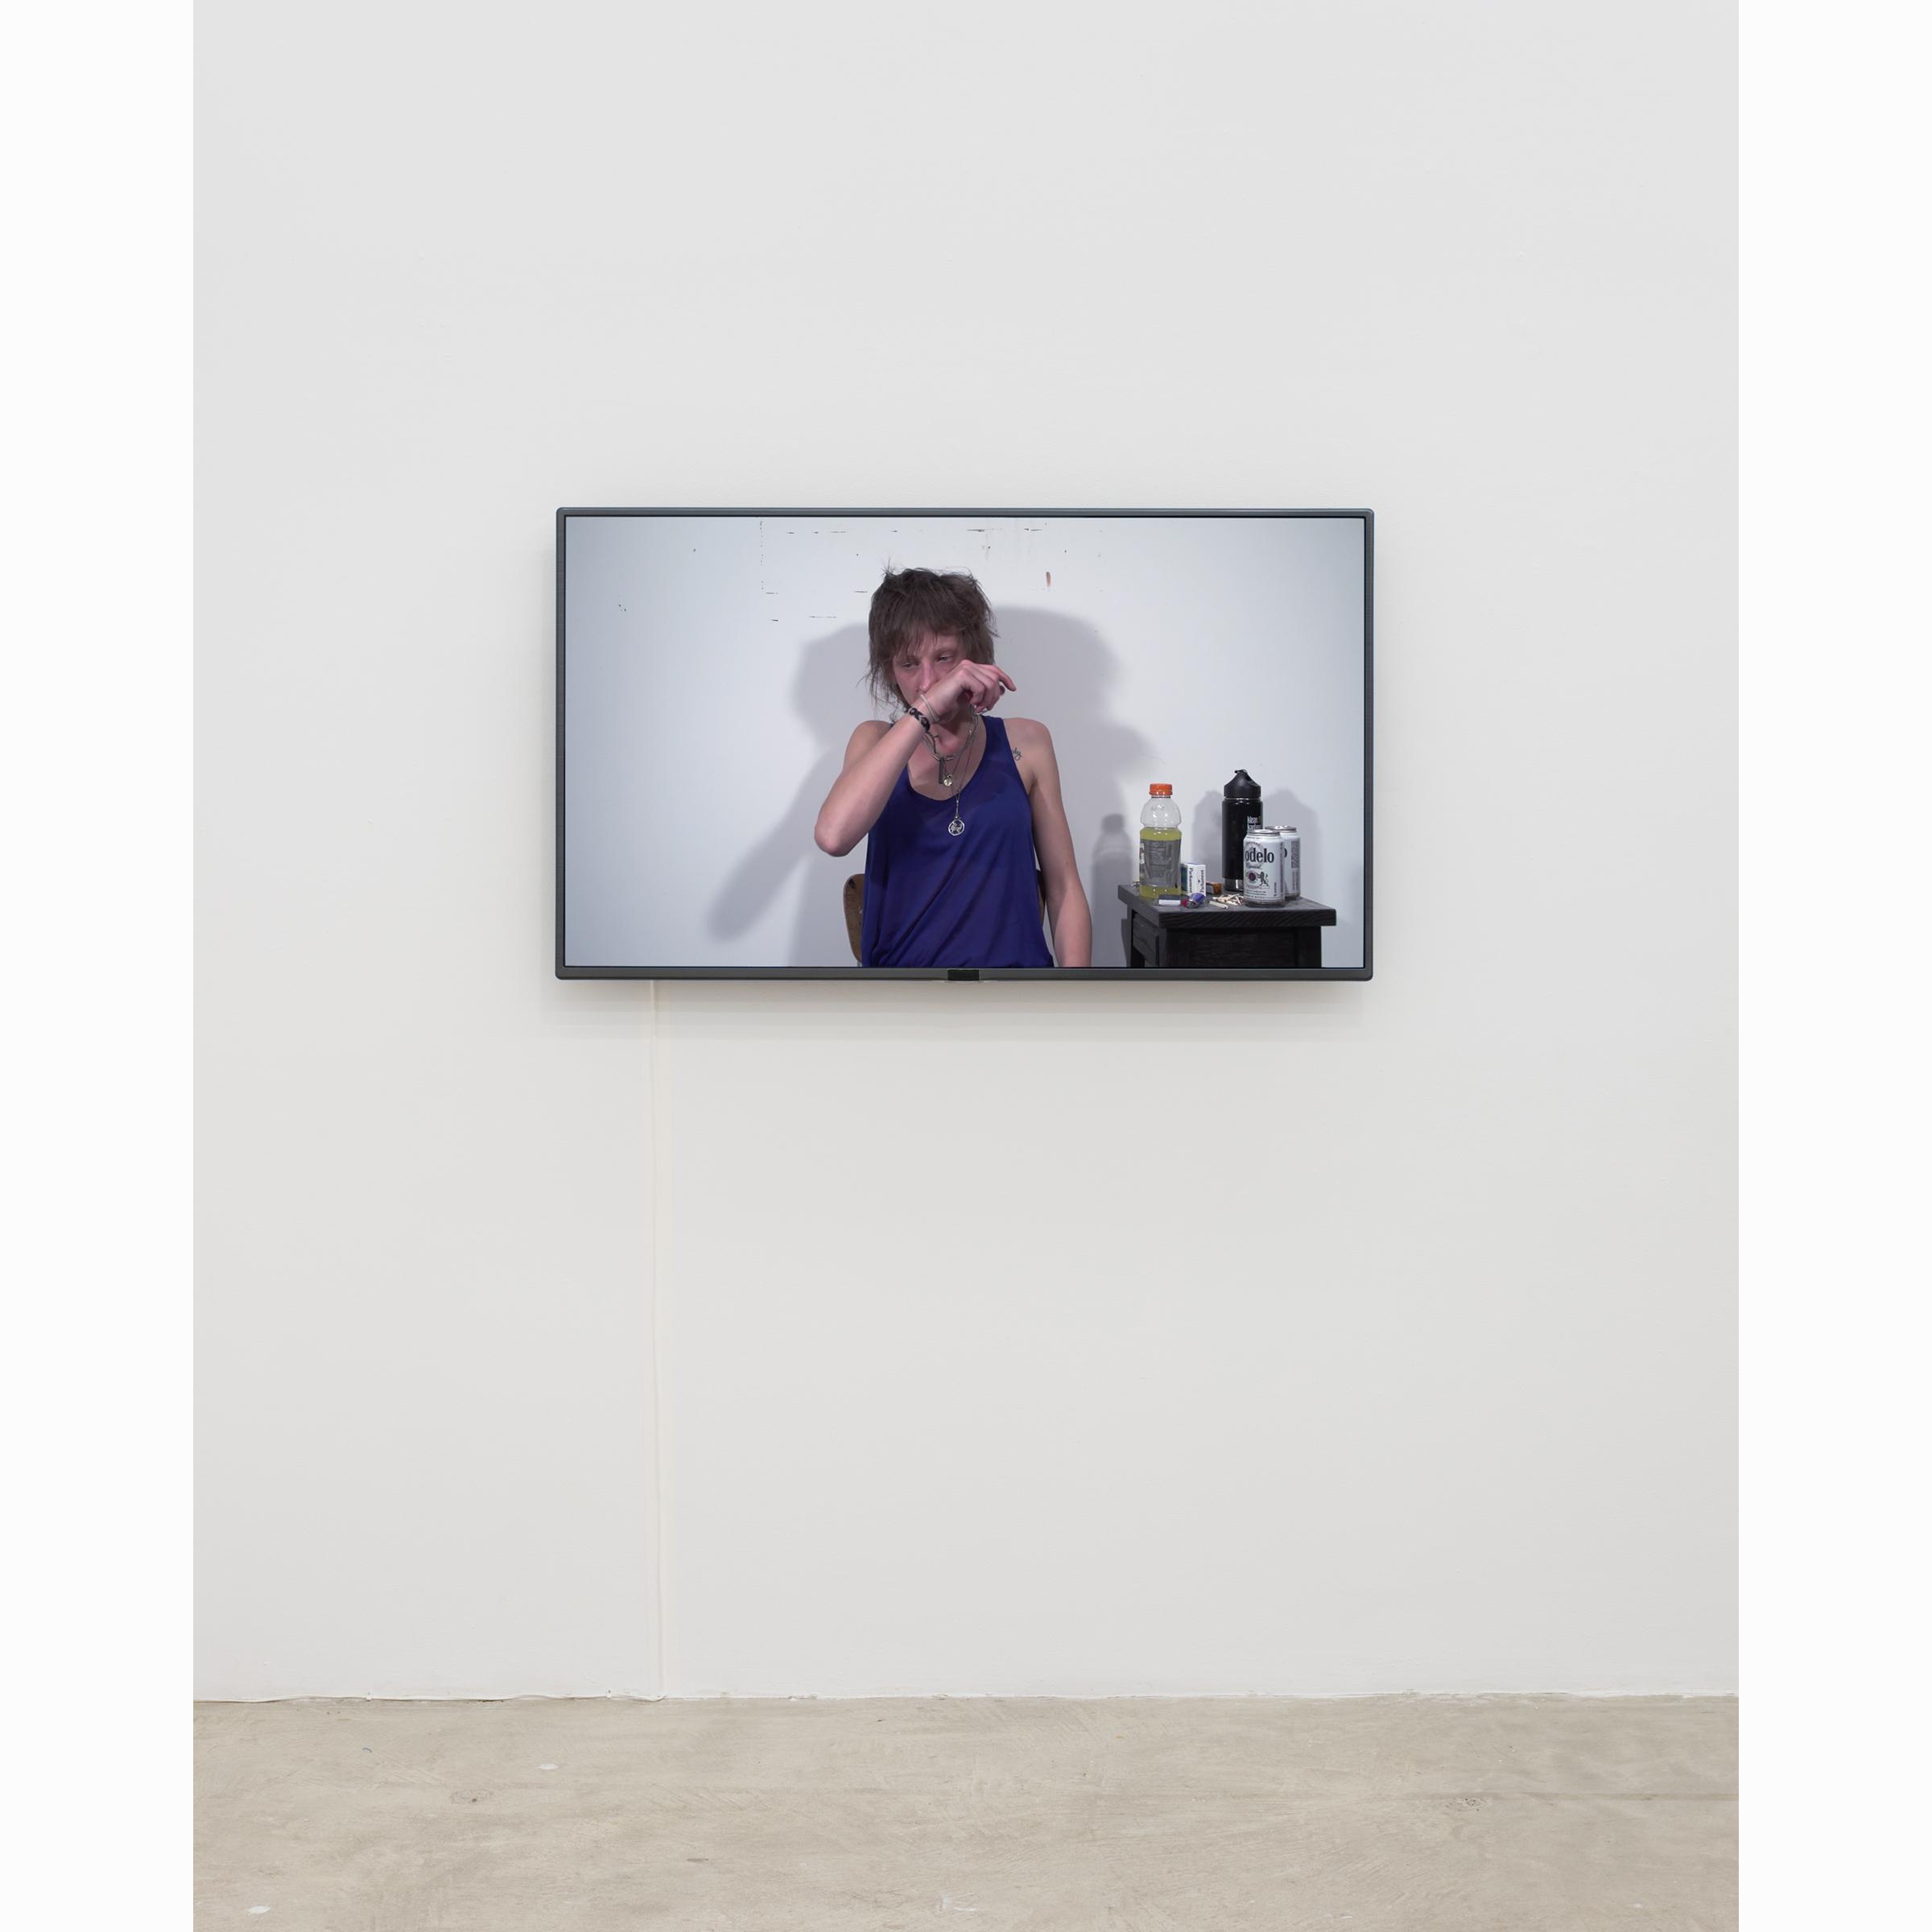 Jennifer Gustavson, I Love You , 2015,HD video,239:41 min, Edition 1/3,Courtesy the Artist